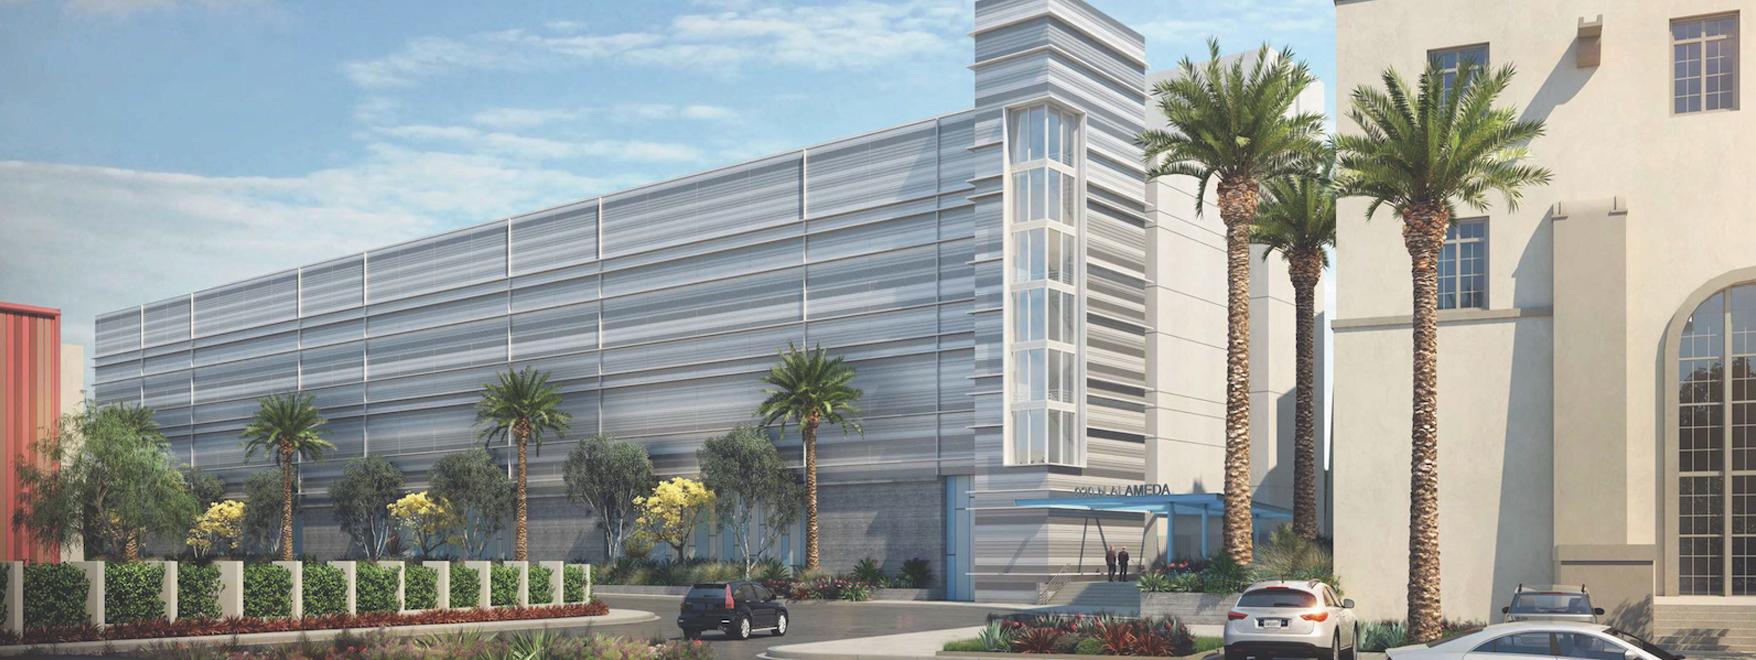 Los Angeles Data Center (LA3)